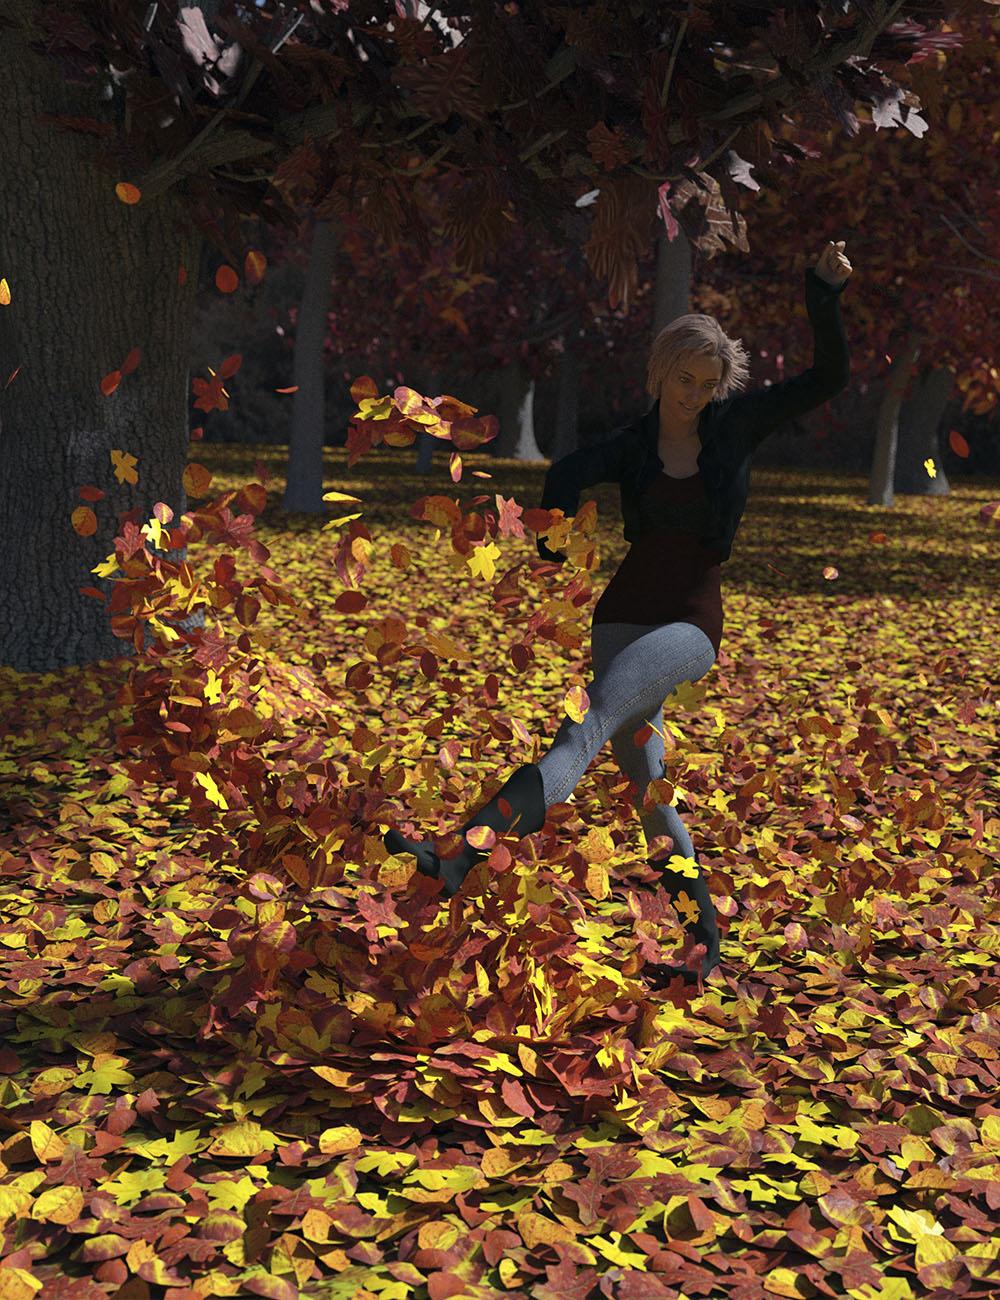 Autumn Leaves by: Orestes Graphics, 3D Models by Daz 3D